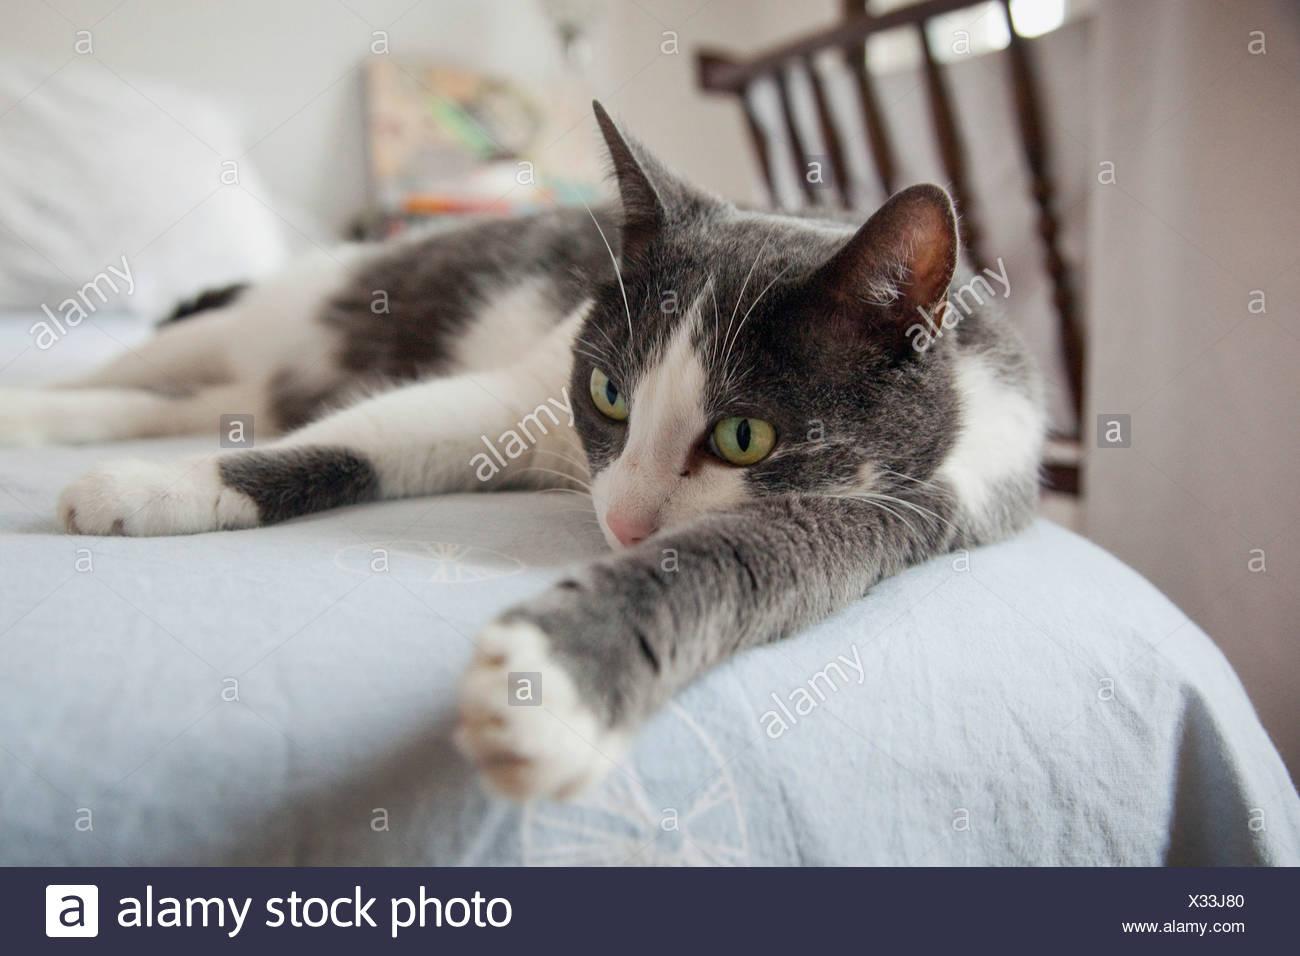 DOMESTIC CAT - Stock Image